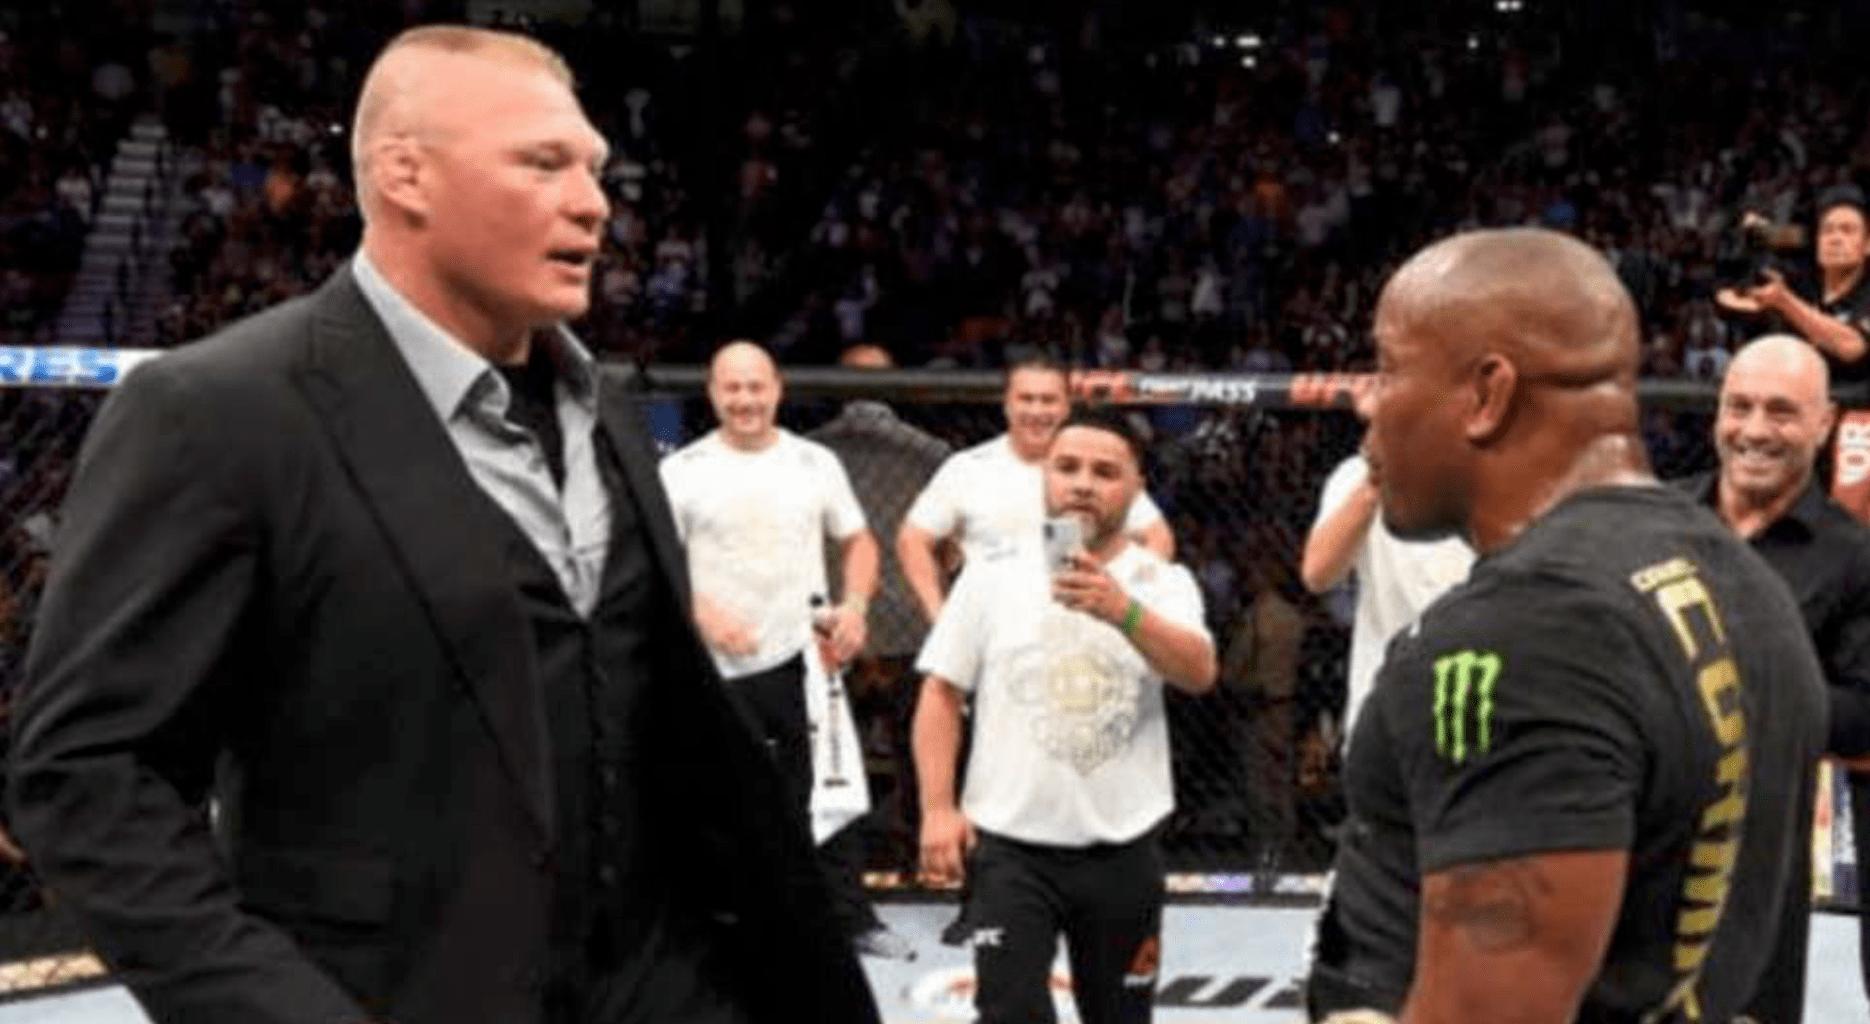 Daniel Cormier Says Brock Lesnar Made The Smart Decision